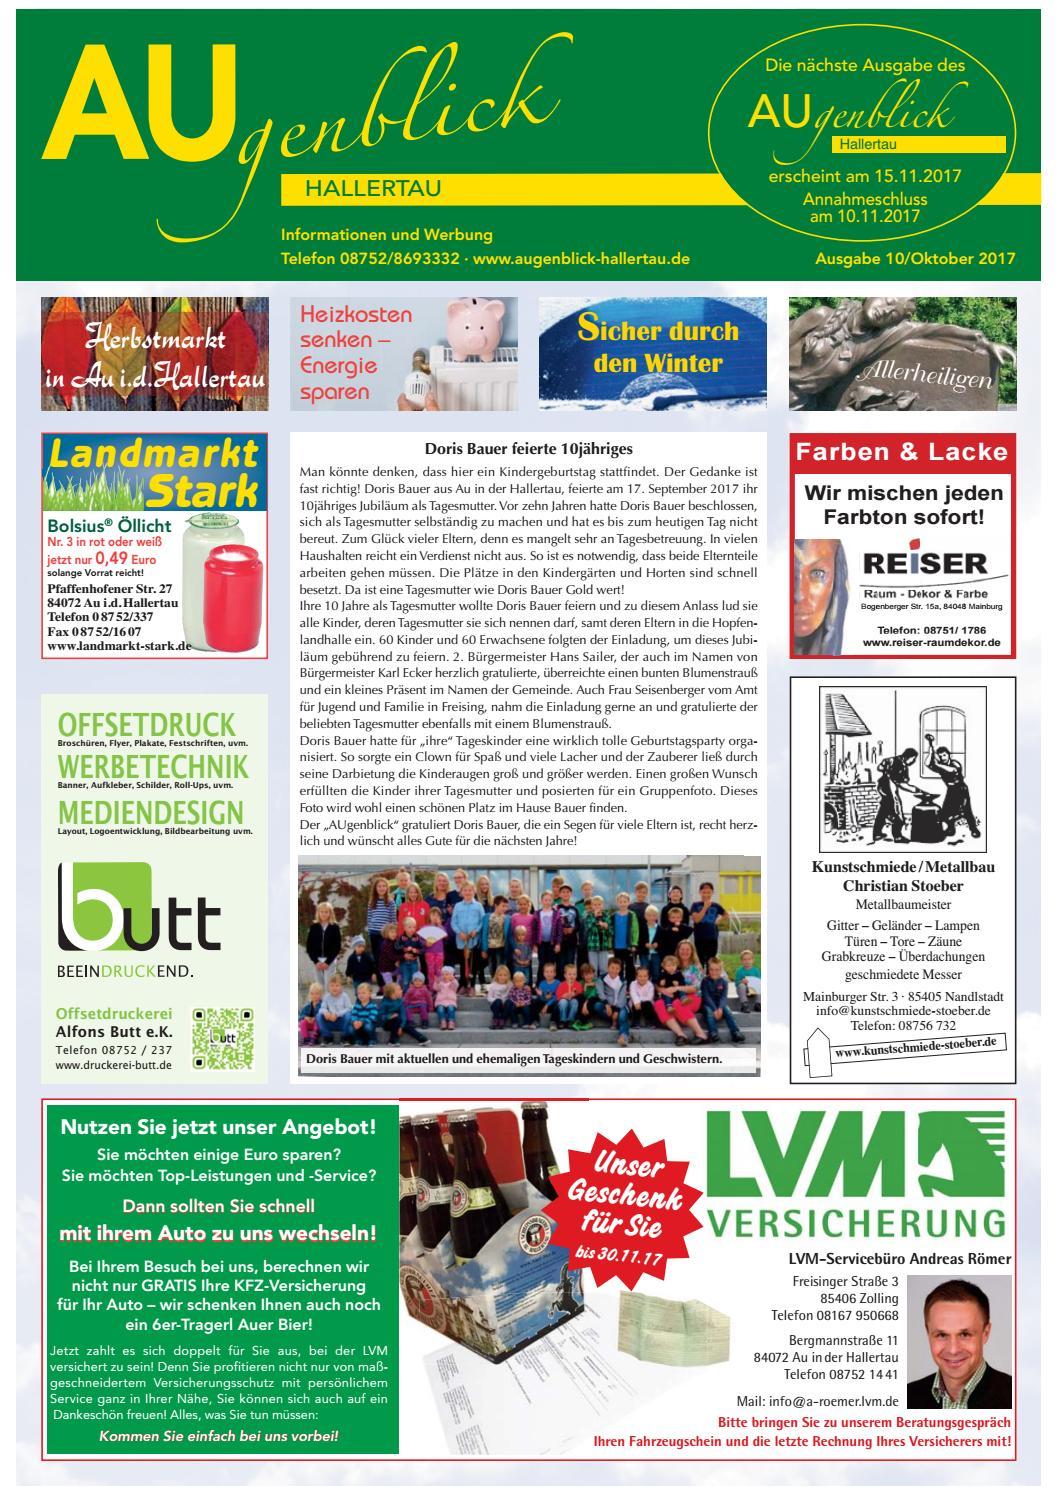 Augenblick Hallertau Ausgabe Oktober 2017 By Augenblick